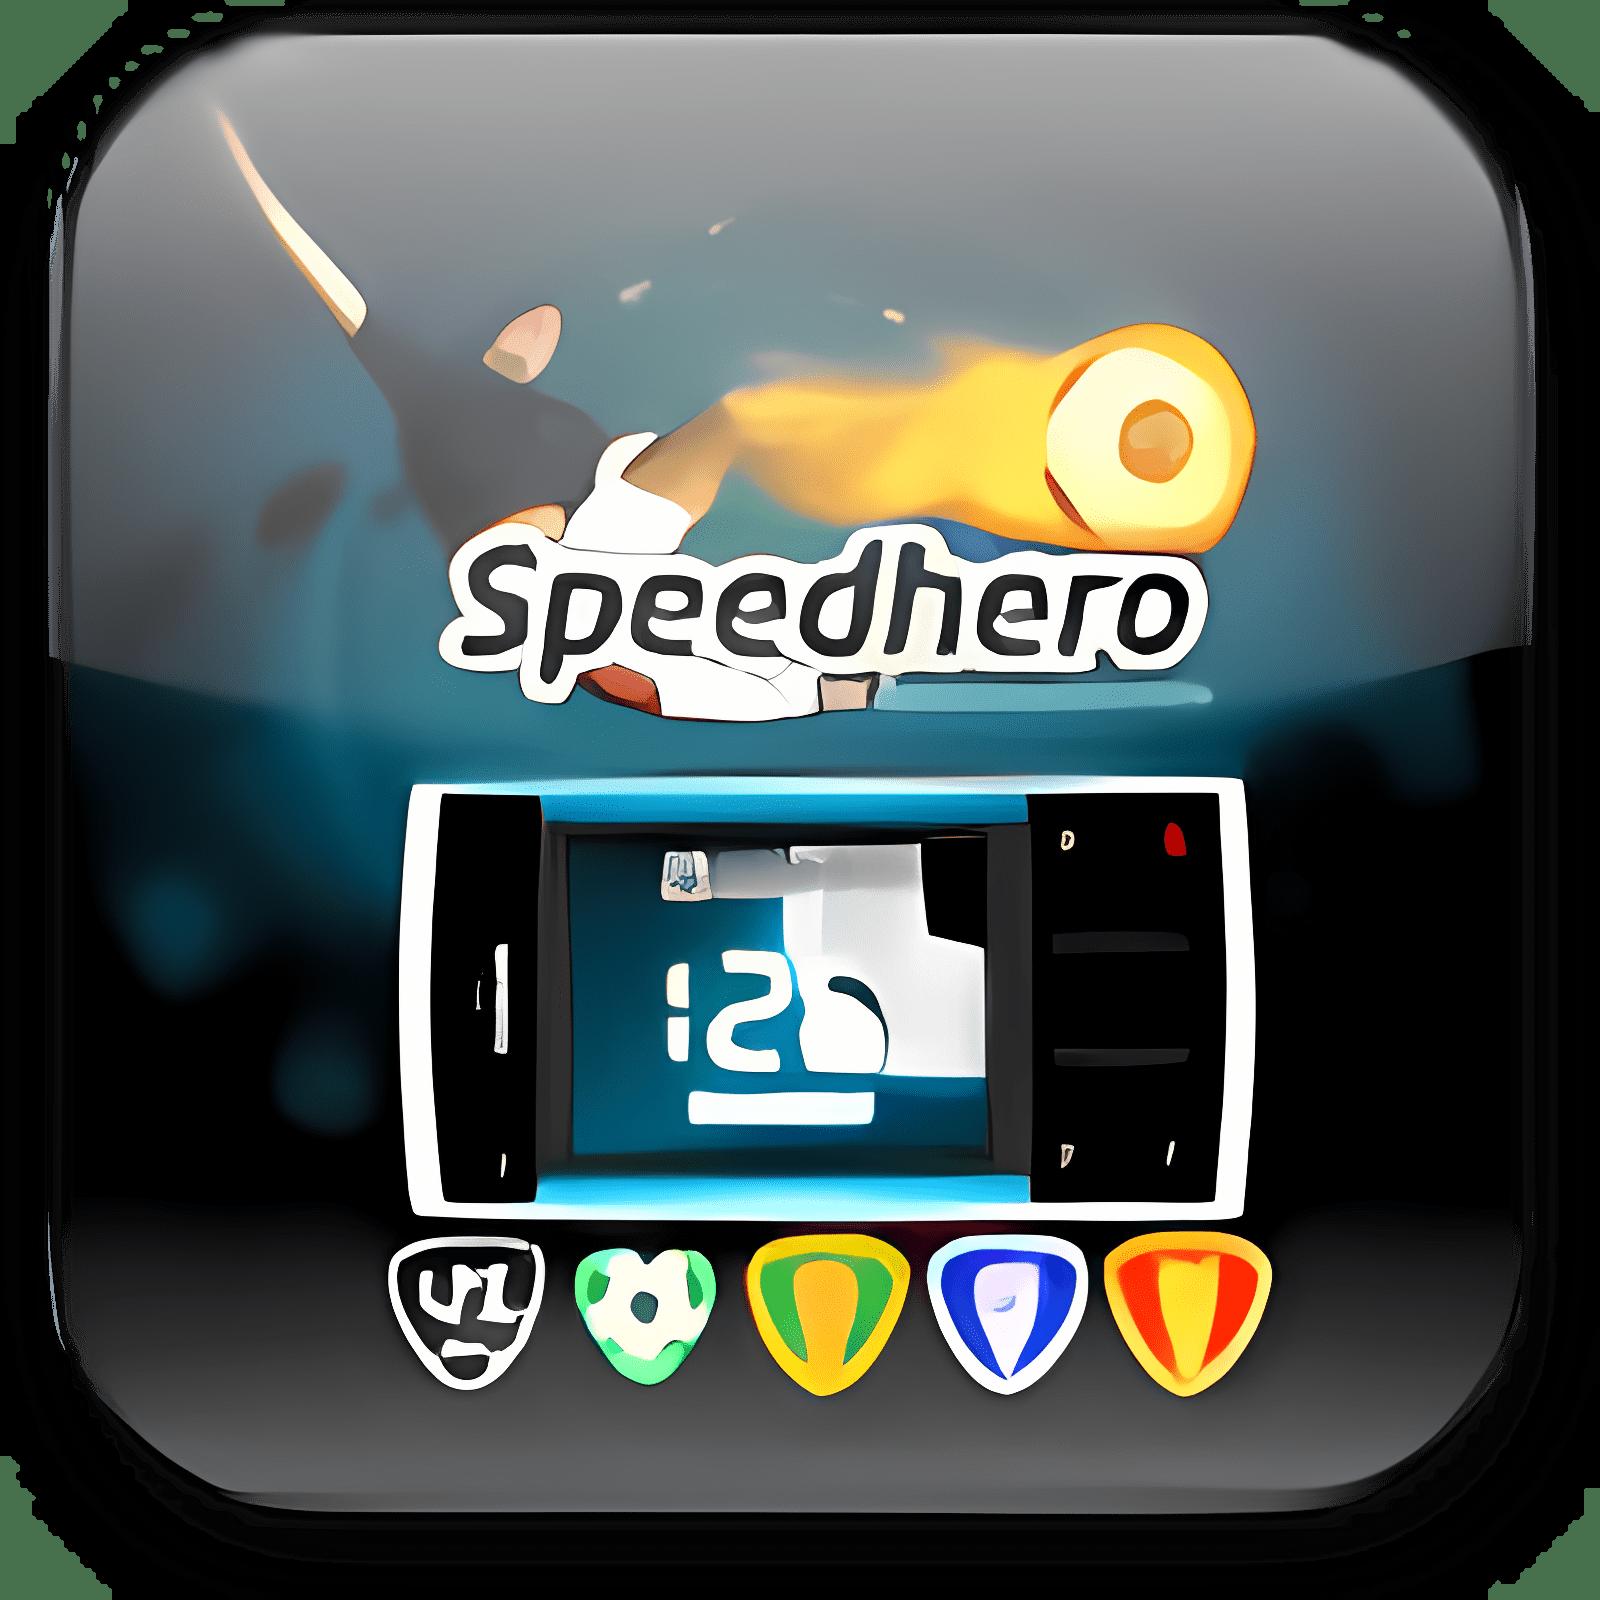 SpeedHero